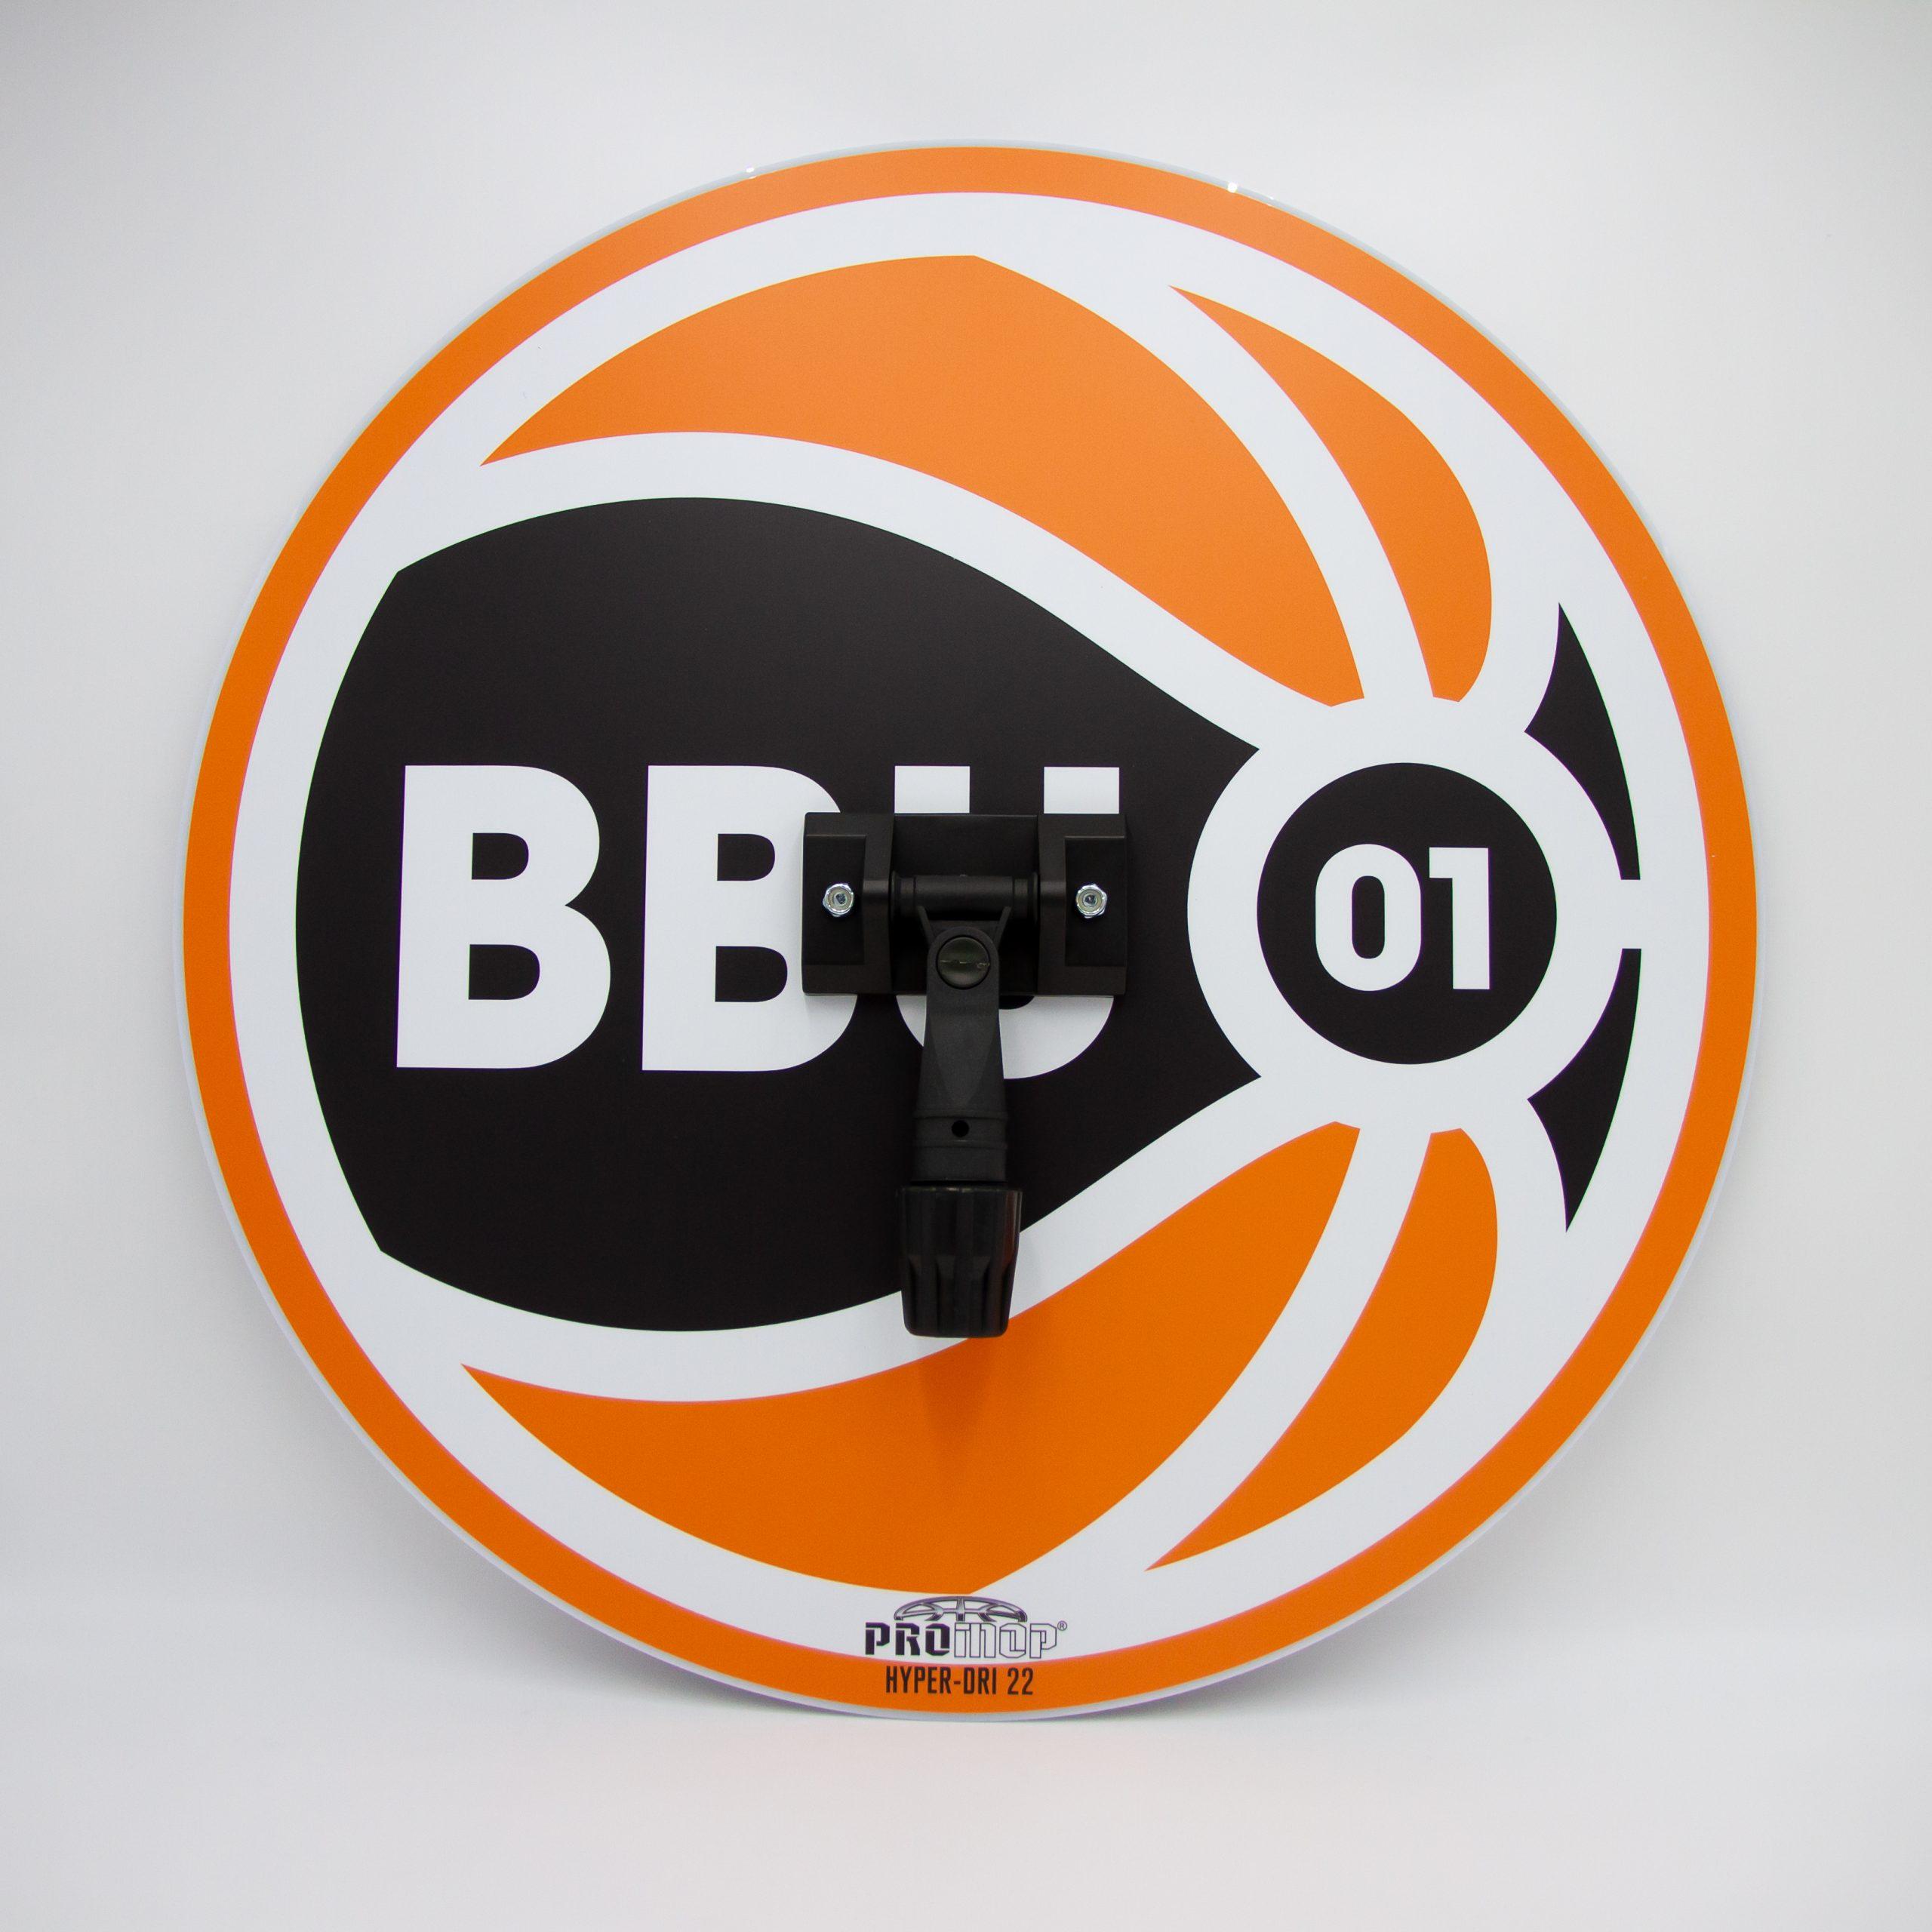 PROMOP HYPER-DRI 22 - ROUND BASKETBALL SWEAT MOP FIBA